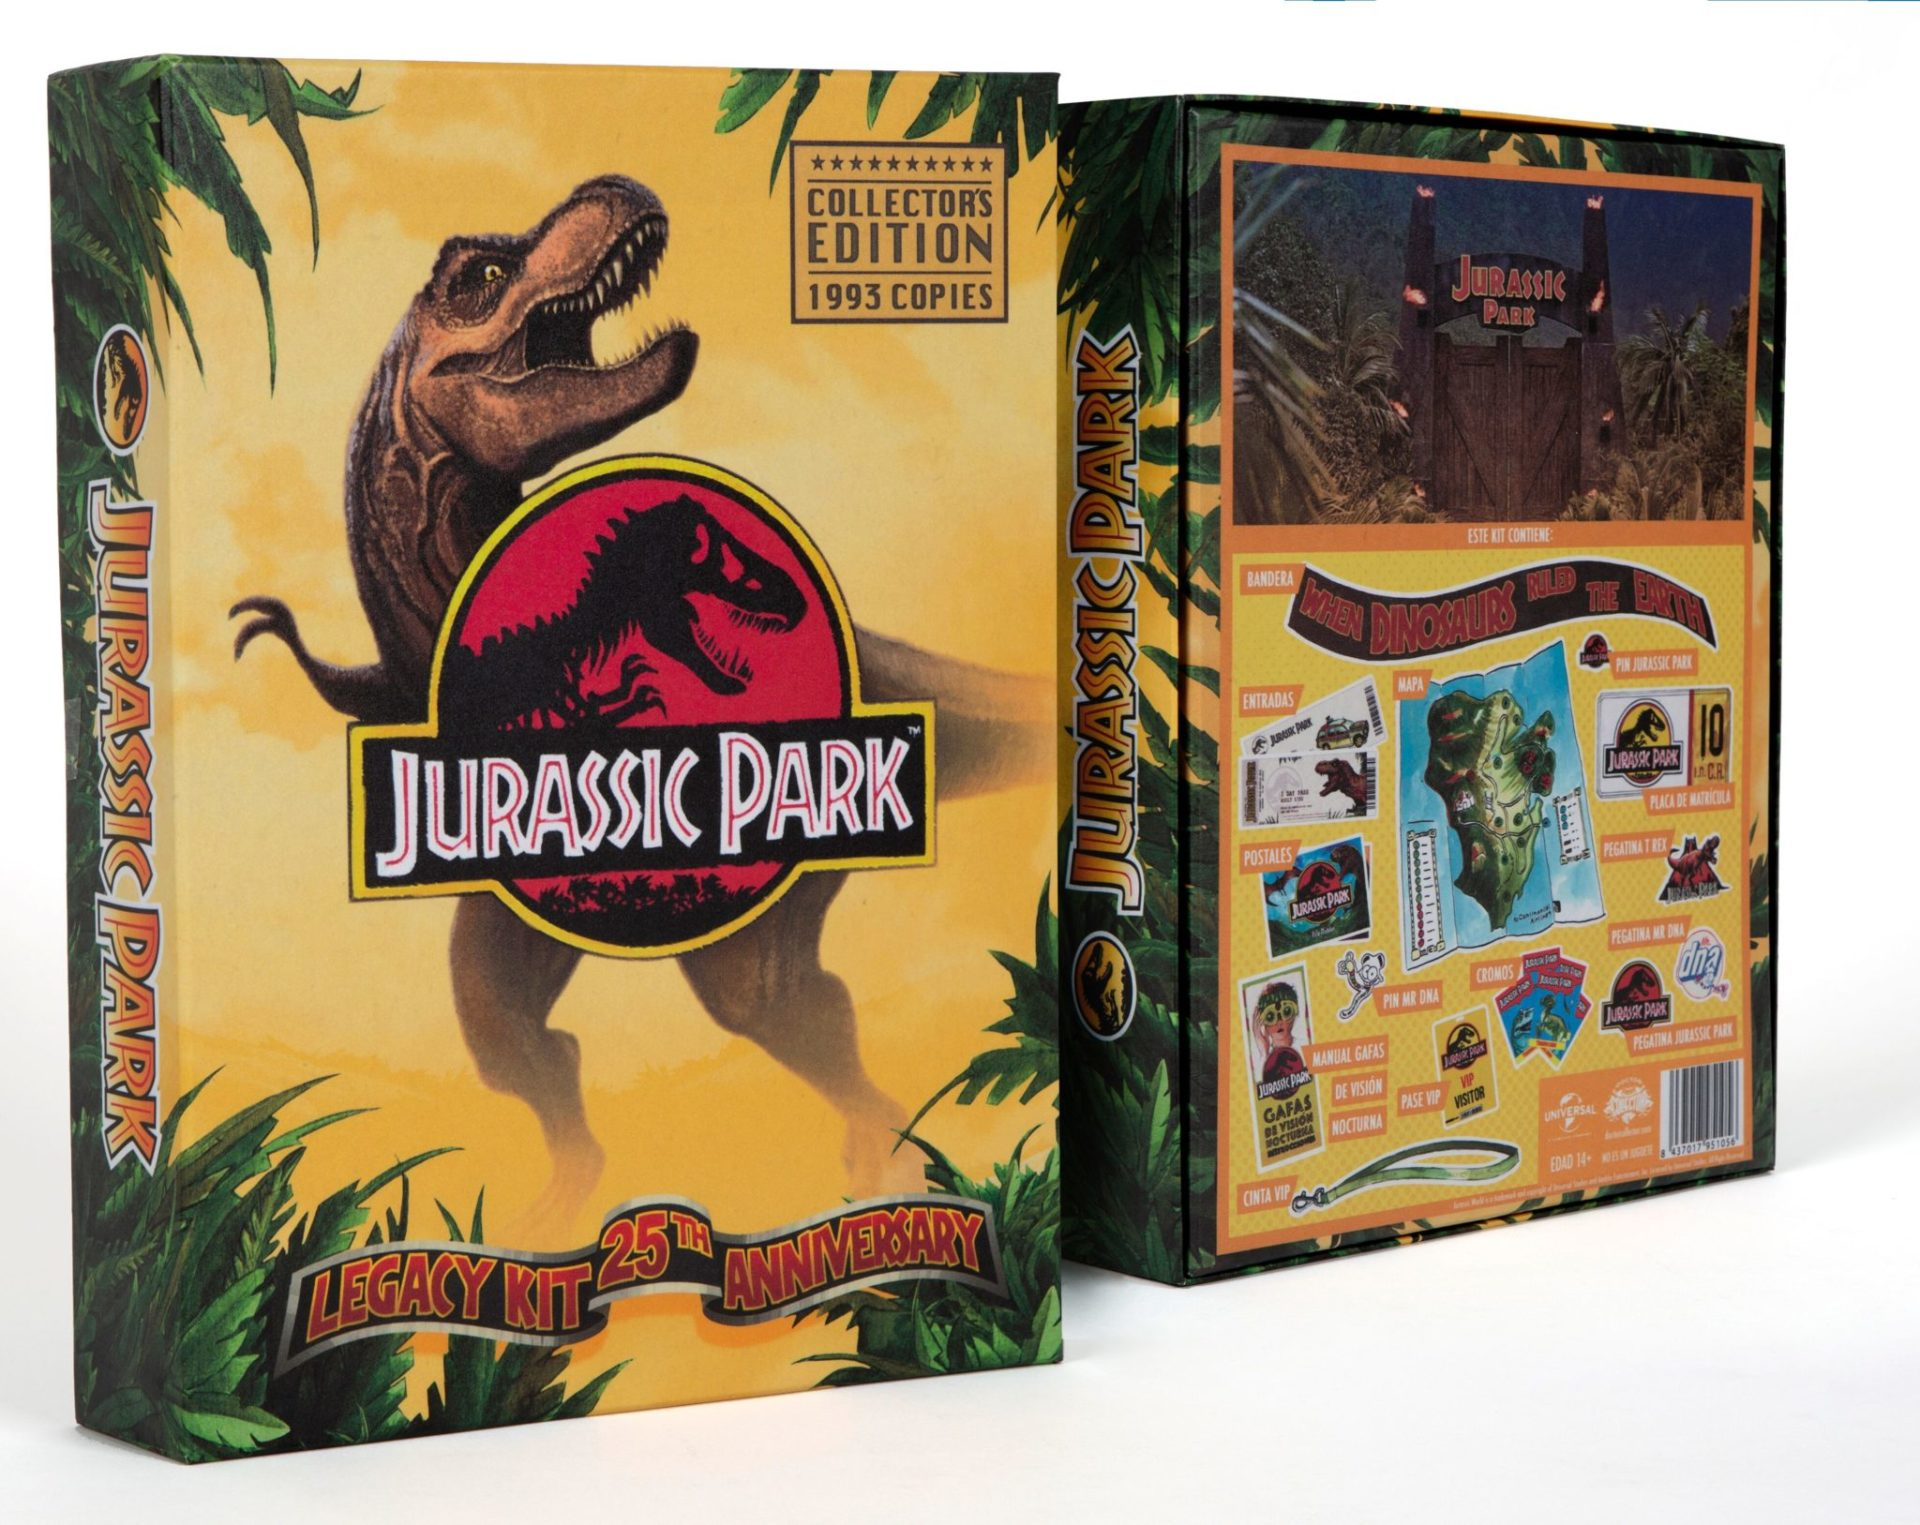 jurassic park legacy kit